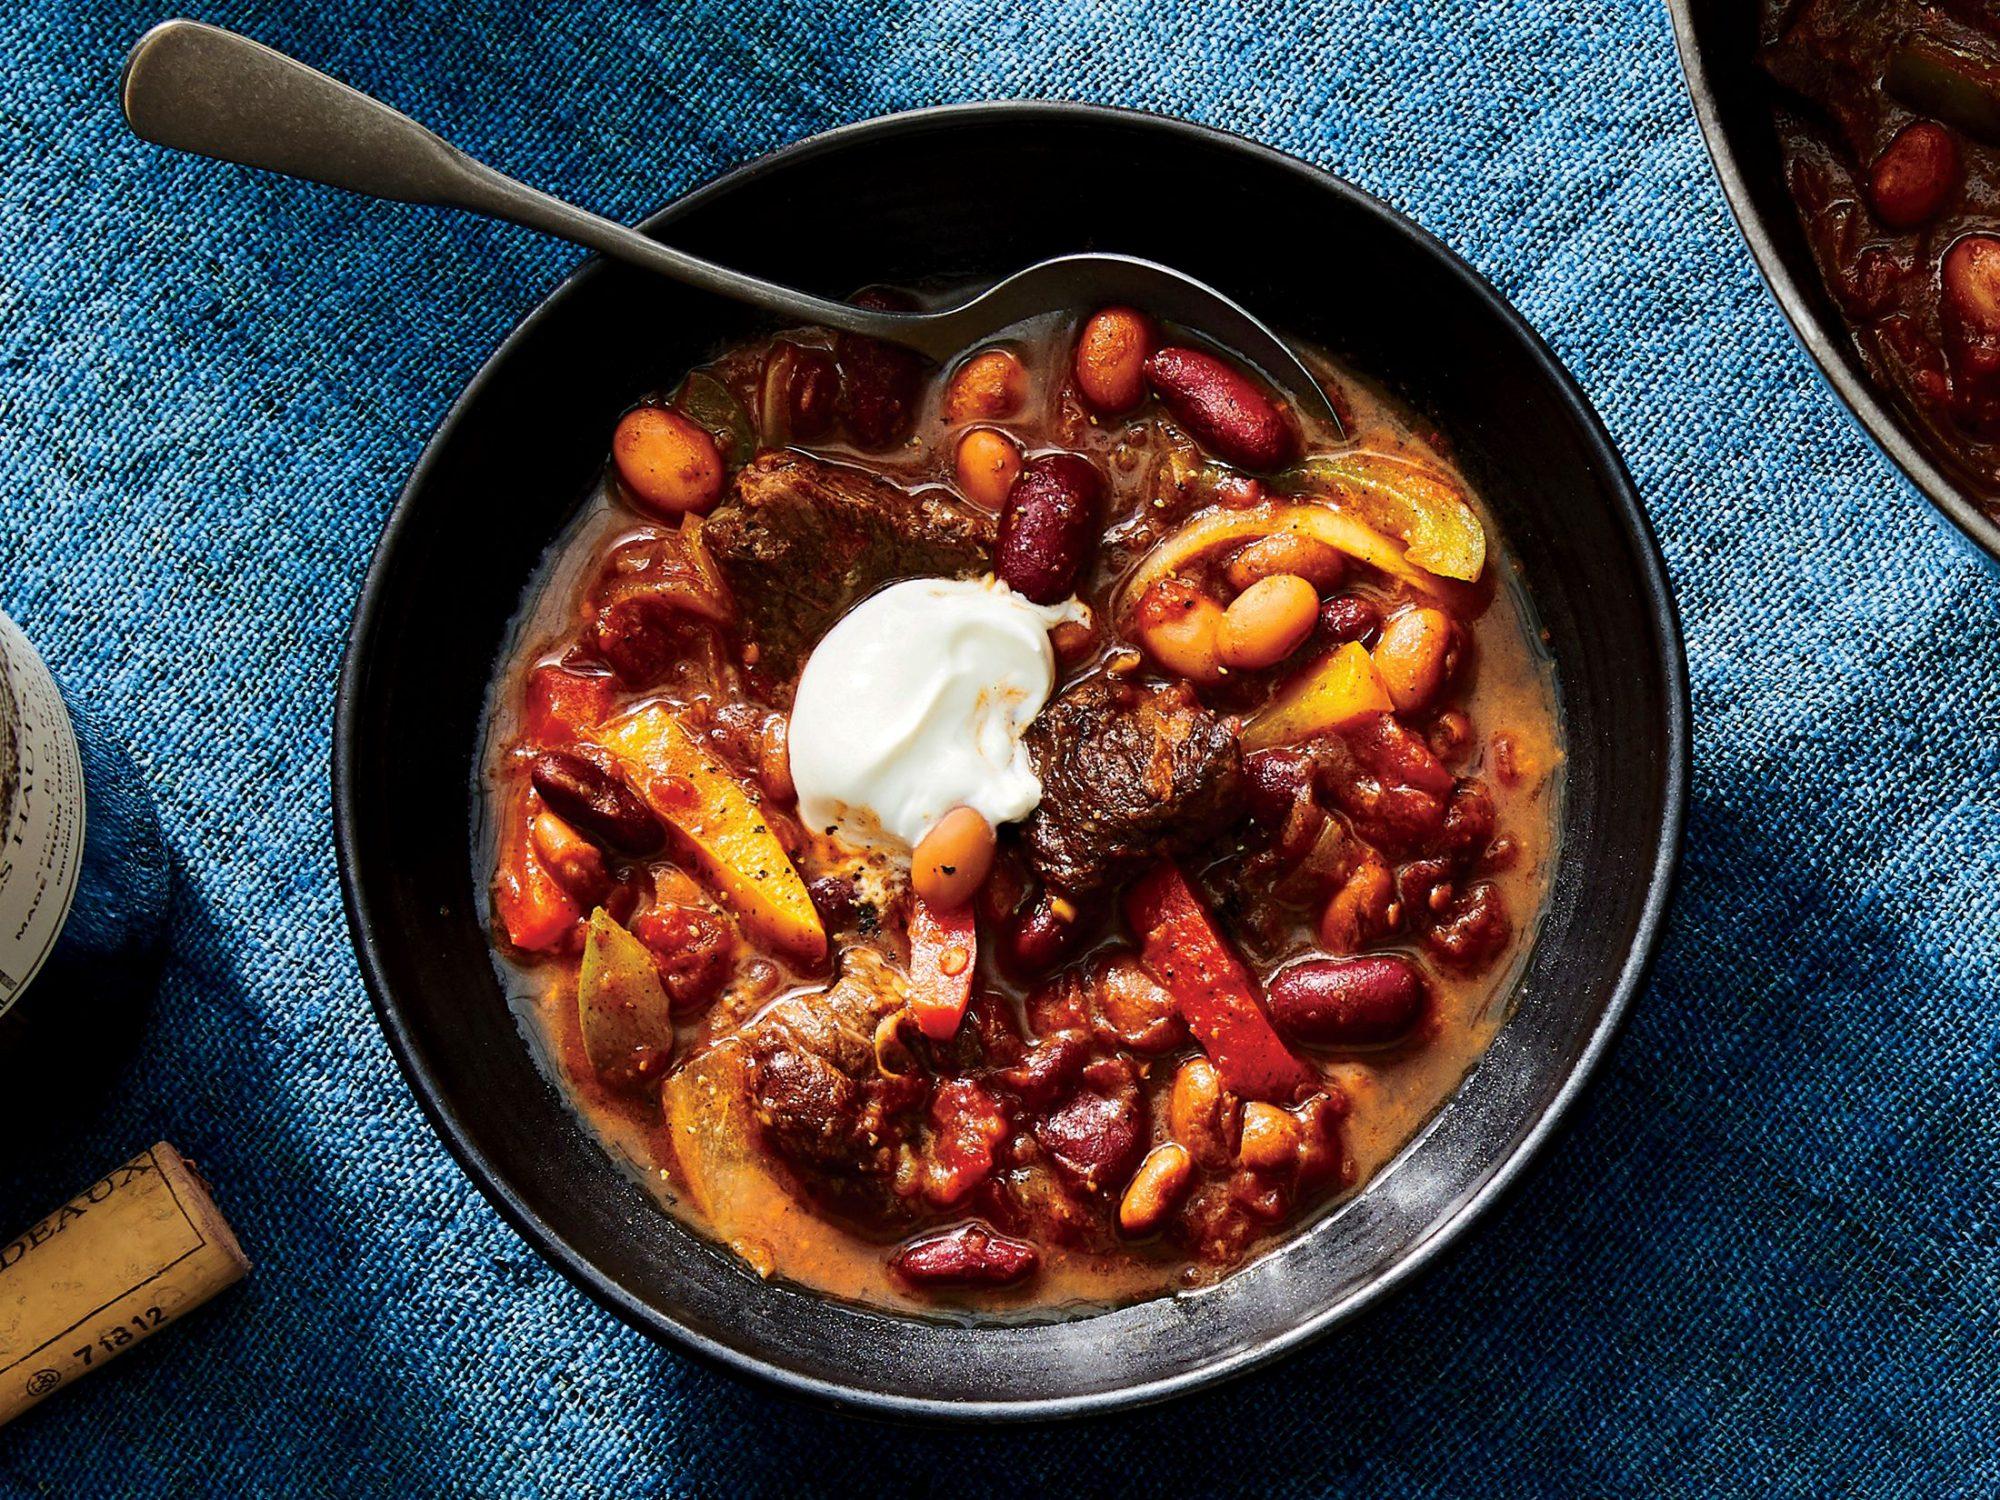 Steak Fajita Chili